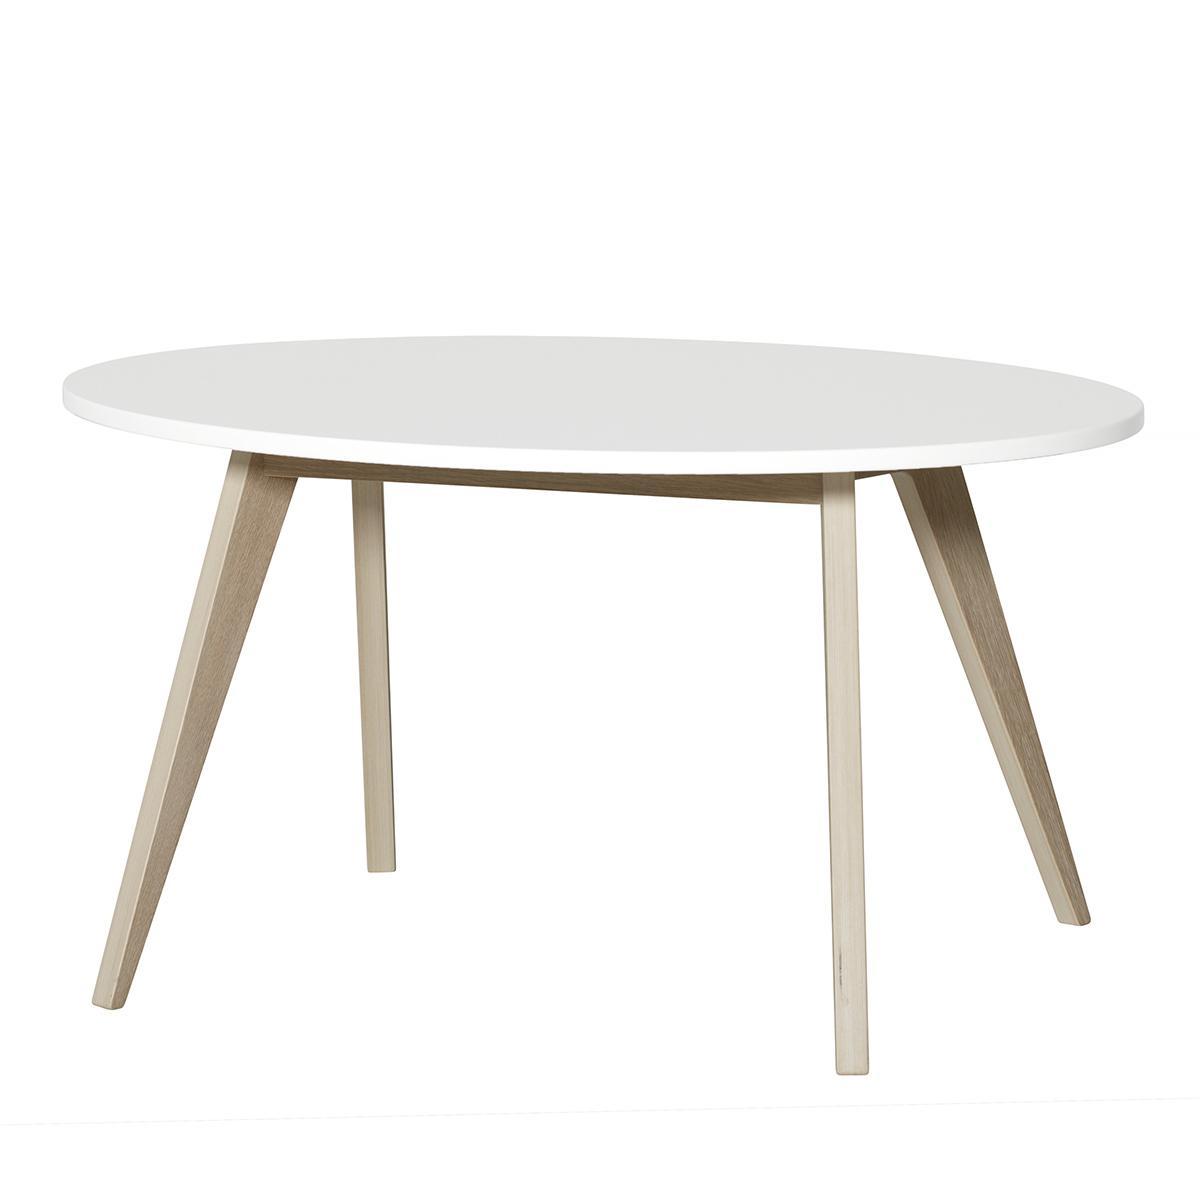 Table PingPong WOOD Oliver Furniture blanc-chêne